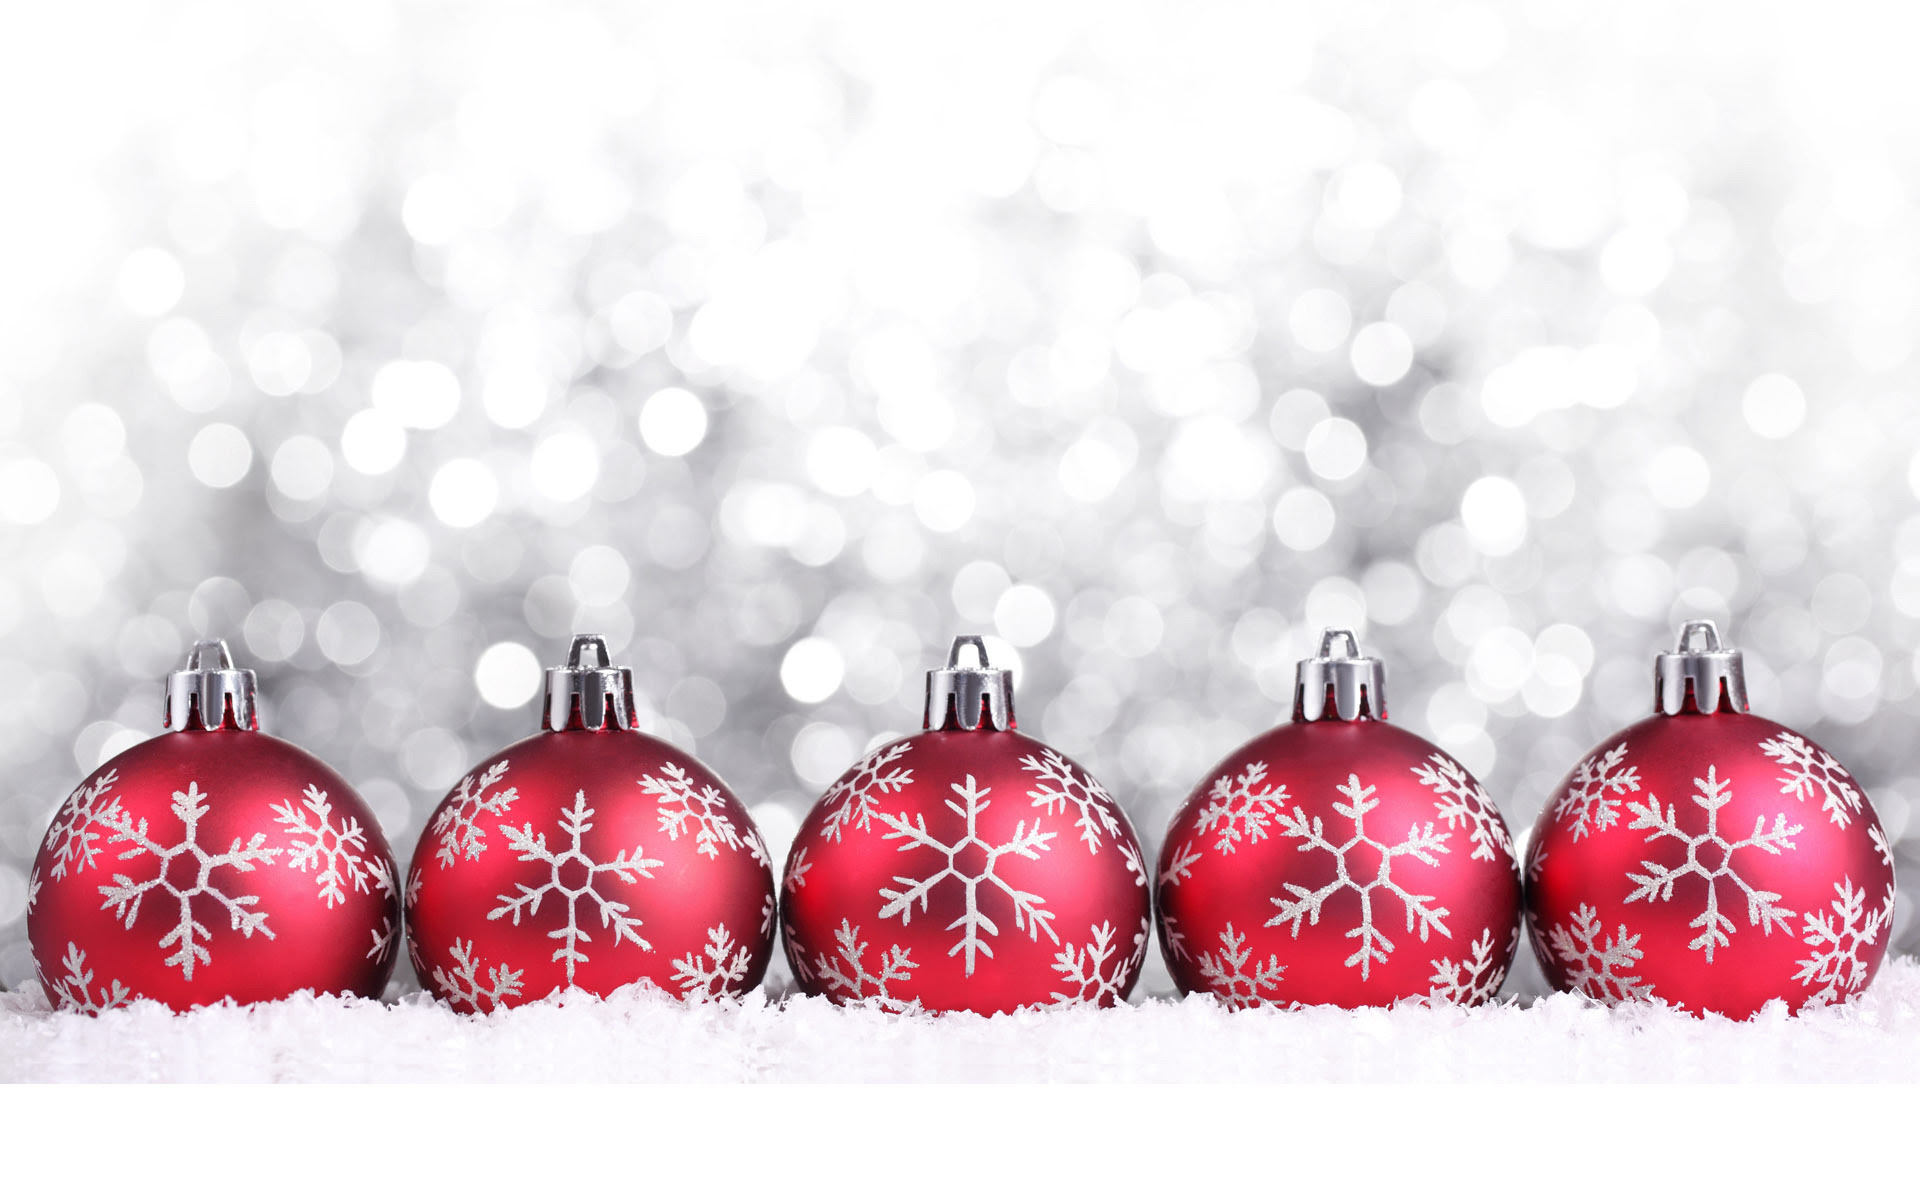 Red Christmas decorations - Christmas Wallpaper (22228015) - Fanpop